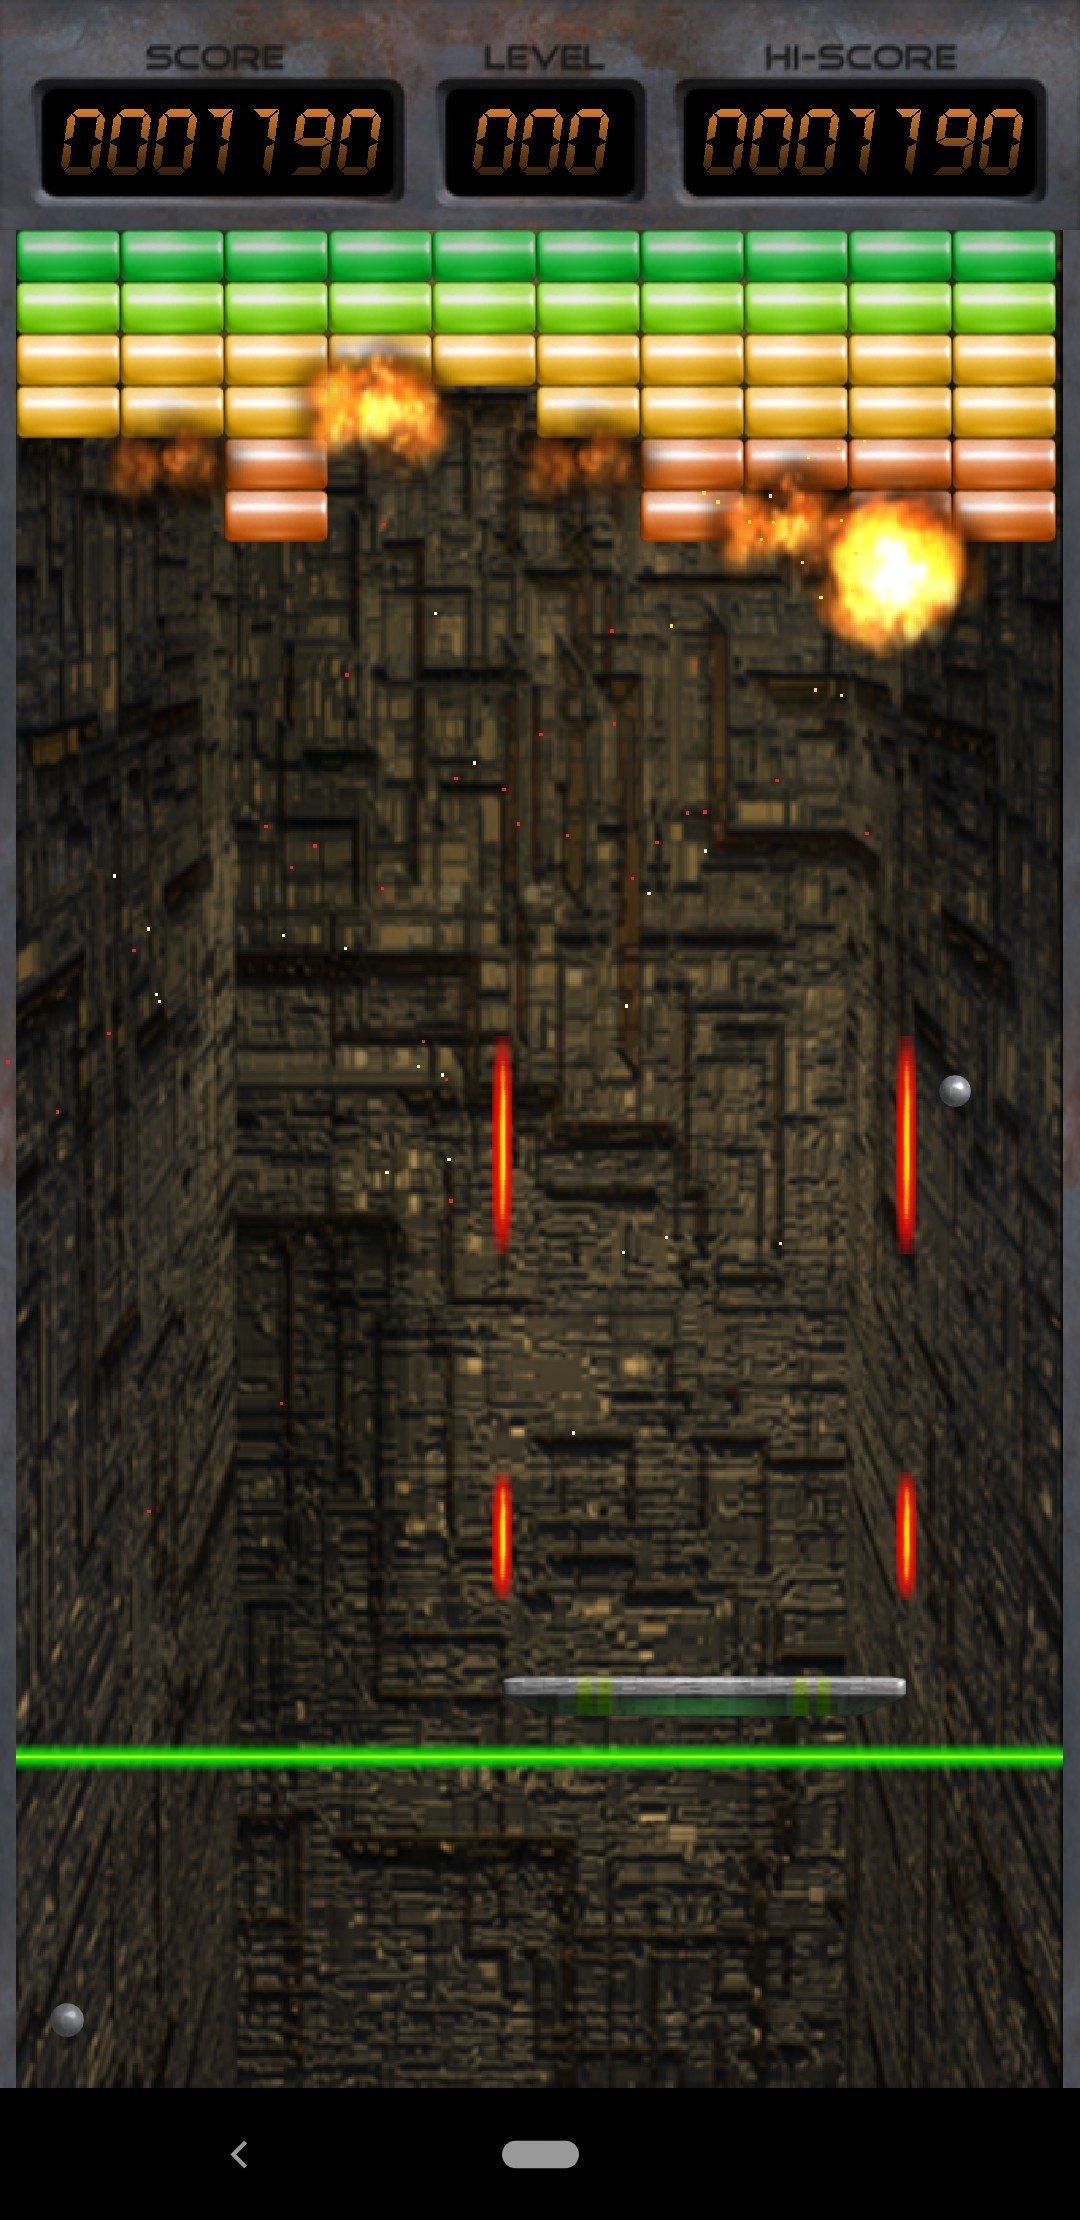 Bricks DEMOLITION Android image 5